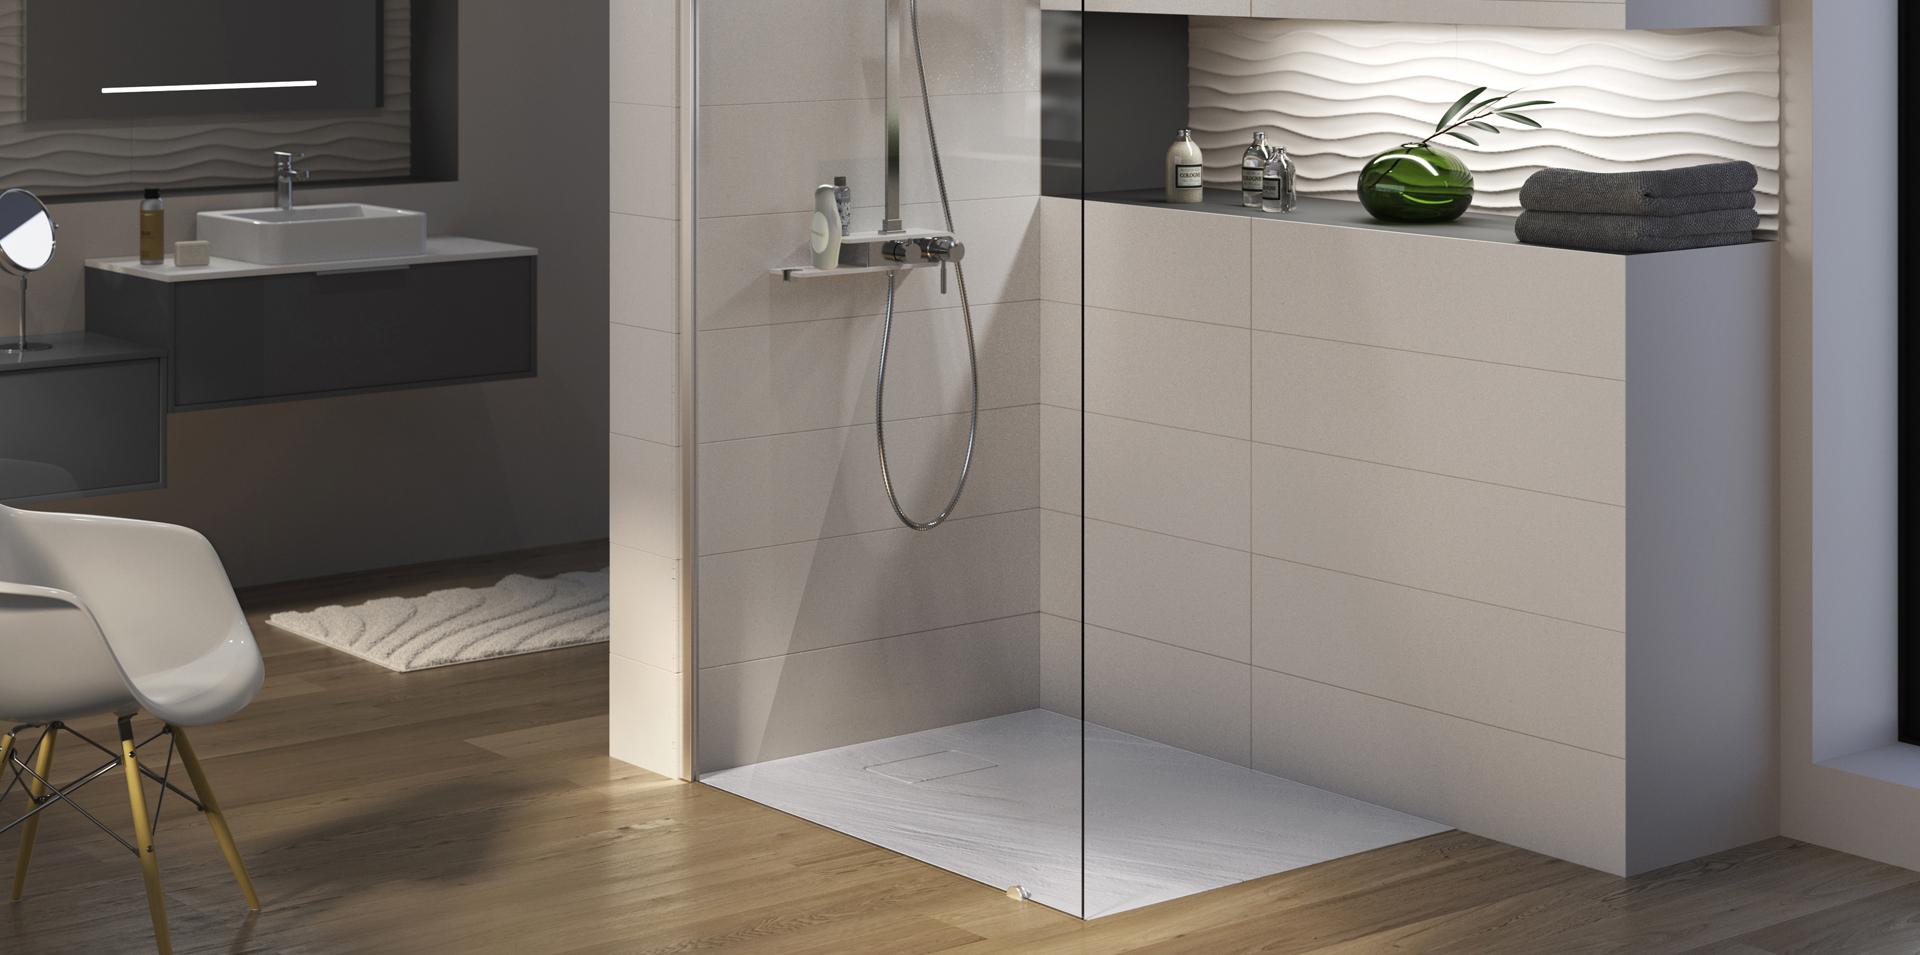 Meubles de salle de bain design  mobilier, baignoires et